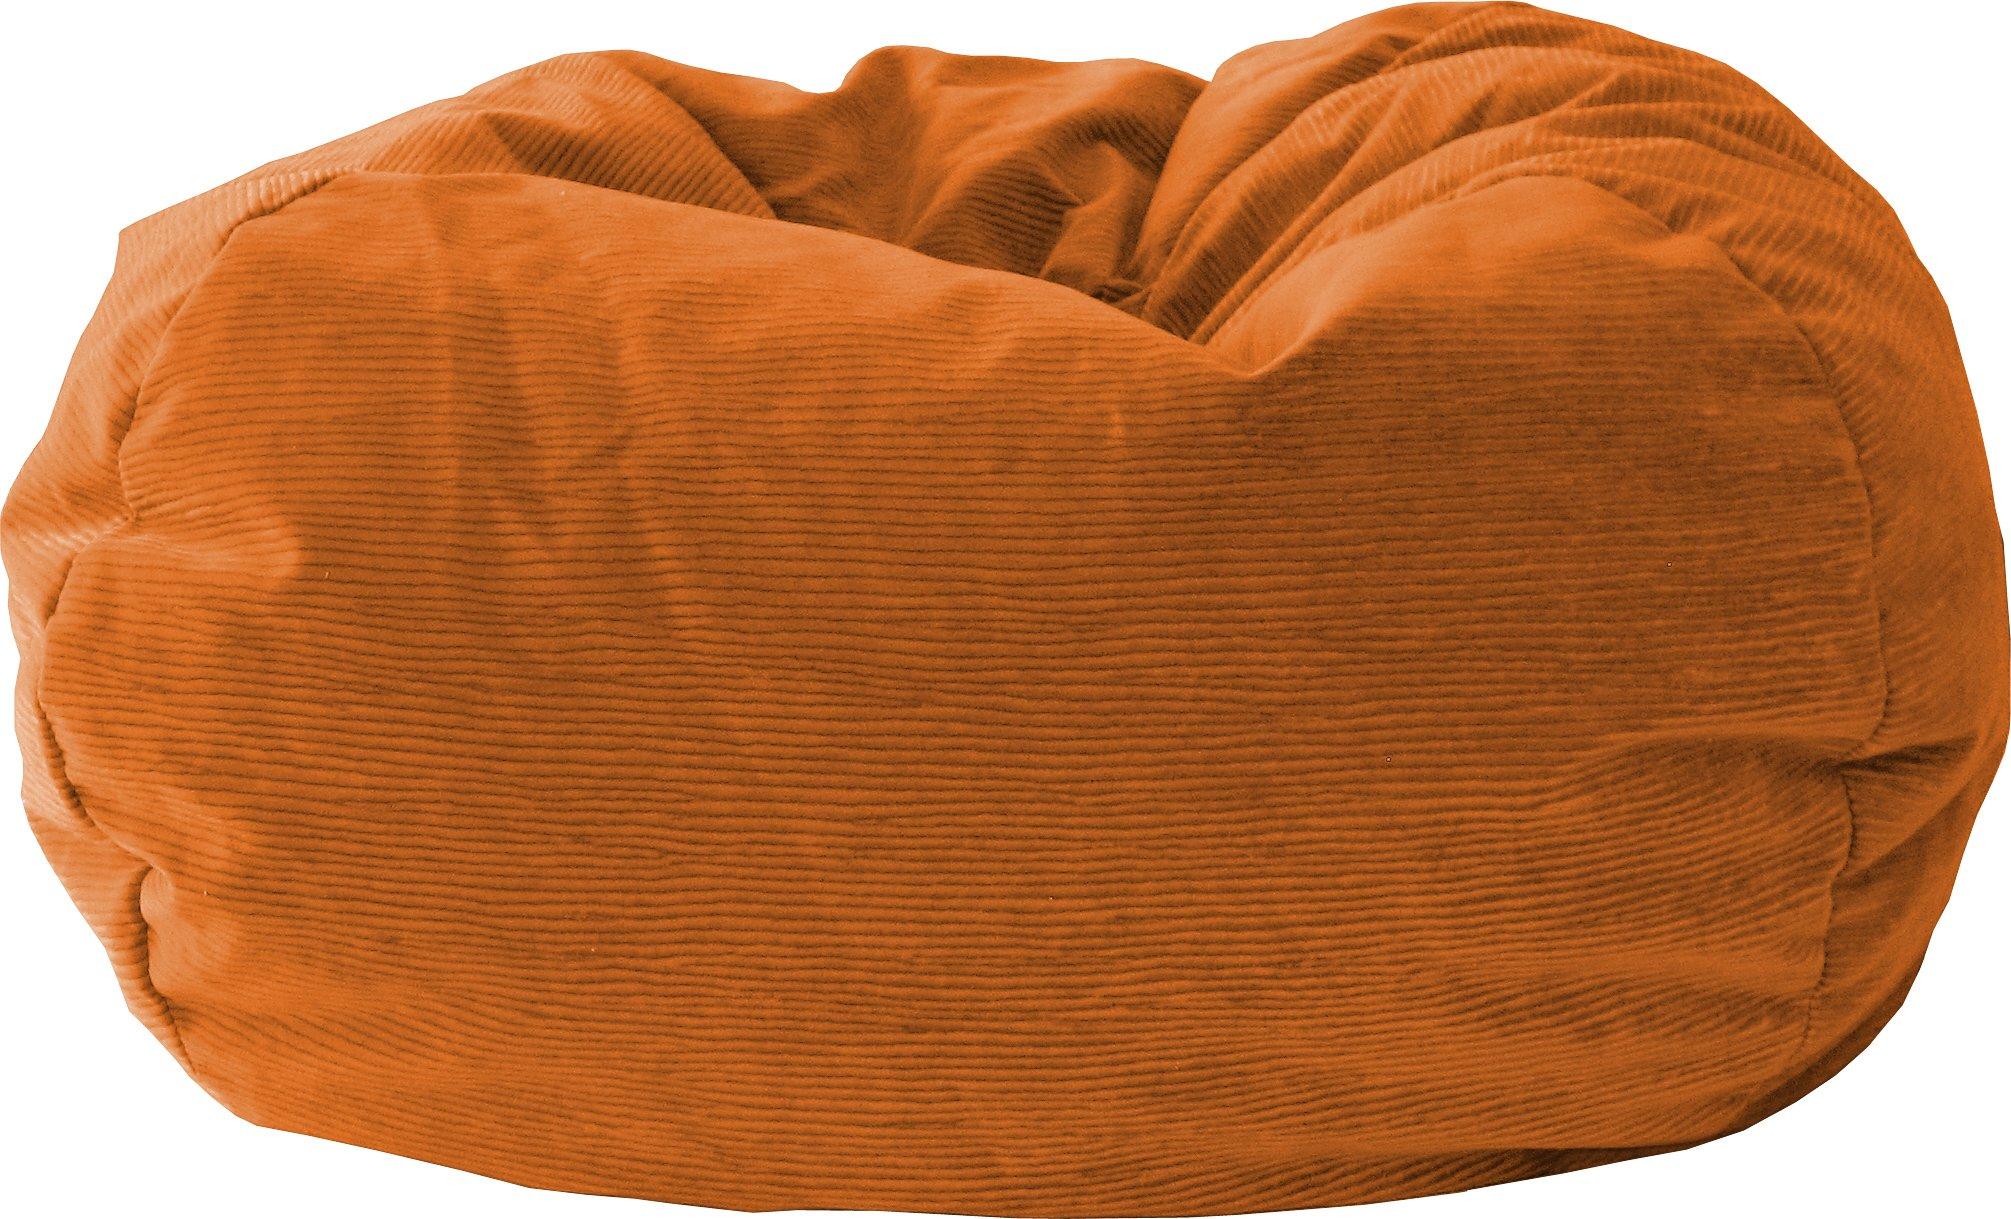 Gold Medal Bean Bags 30014059108 XX-Large Amigo Suede Bean Bag, Orange